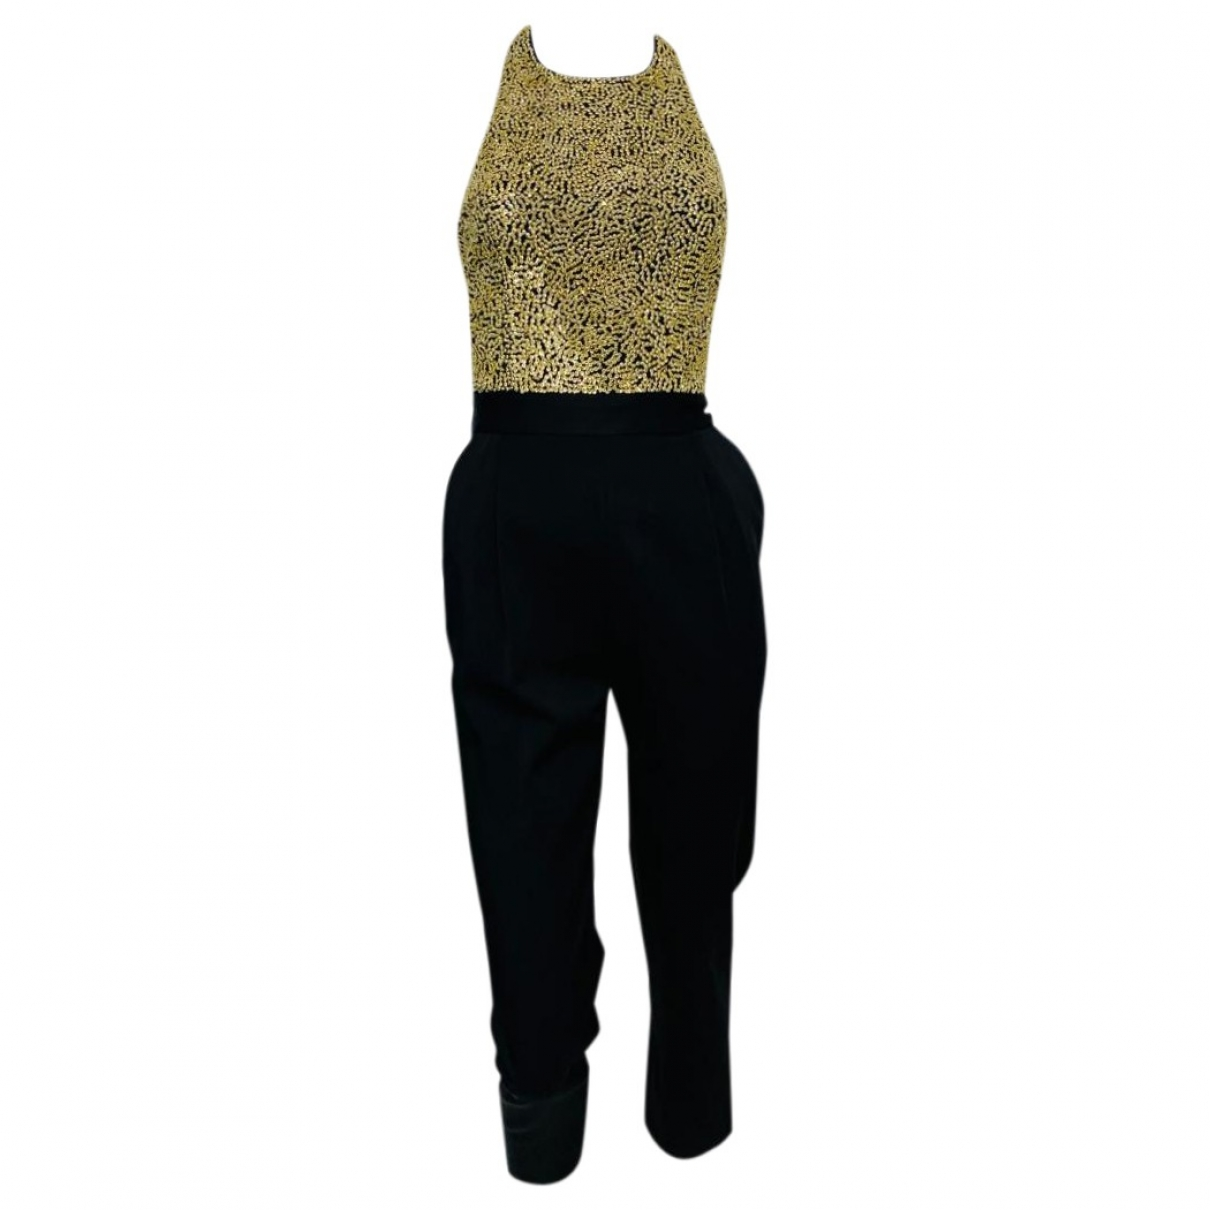 Alice & Olivia \N Black jumpsuit for Women 0 0-5